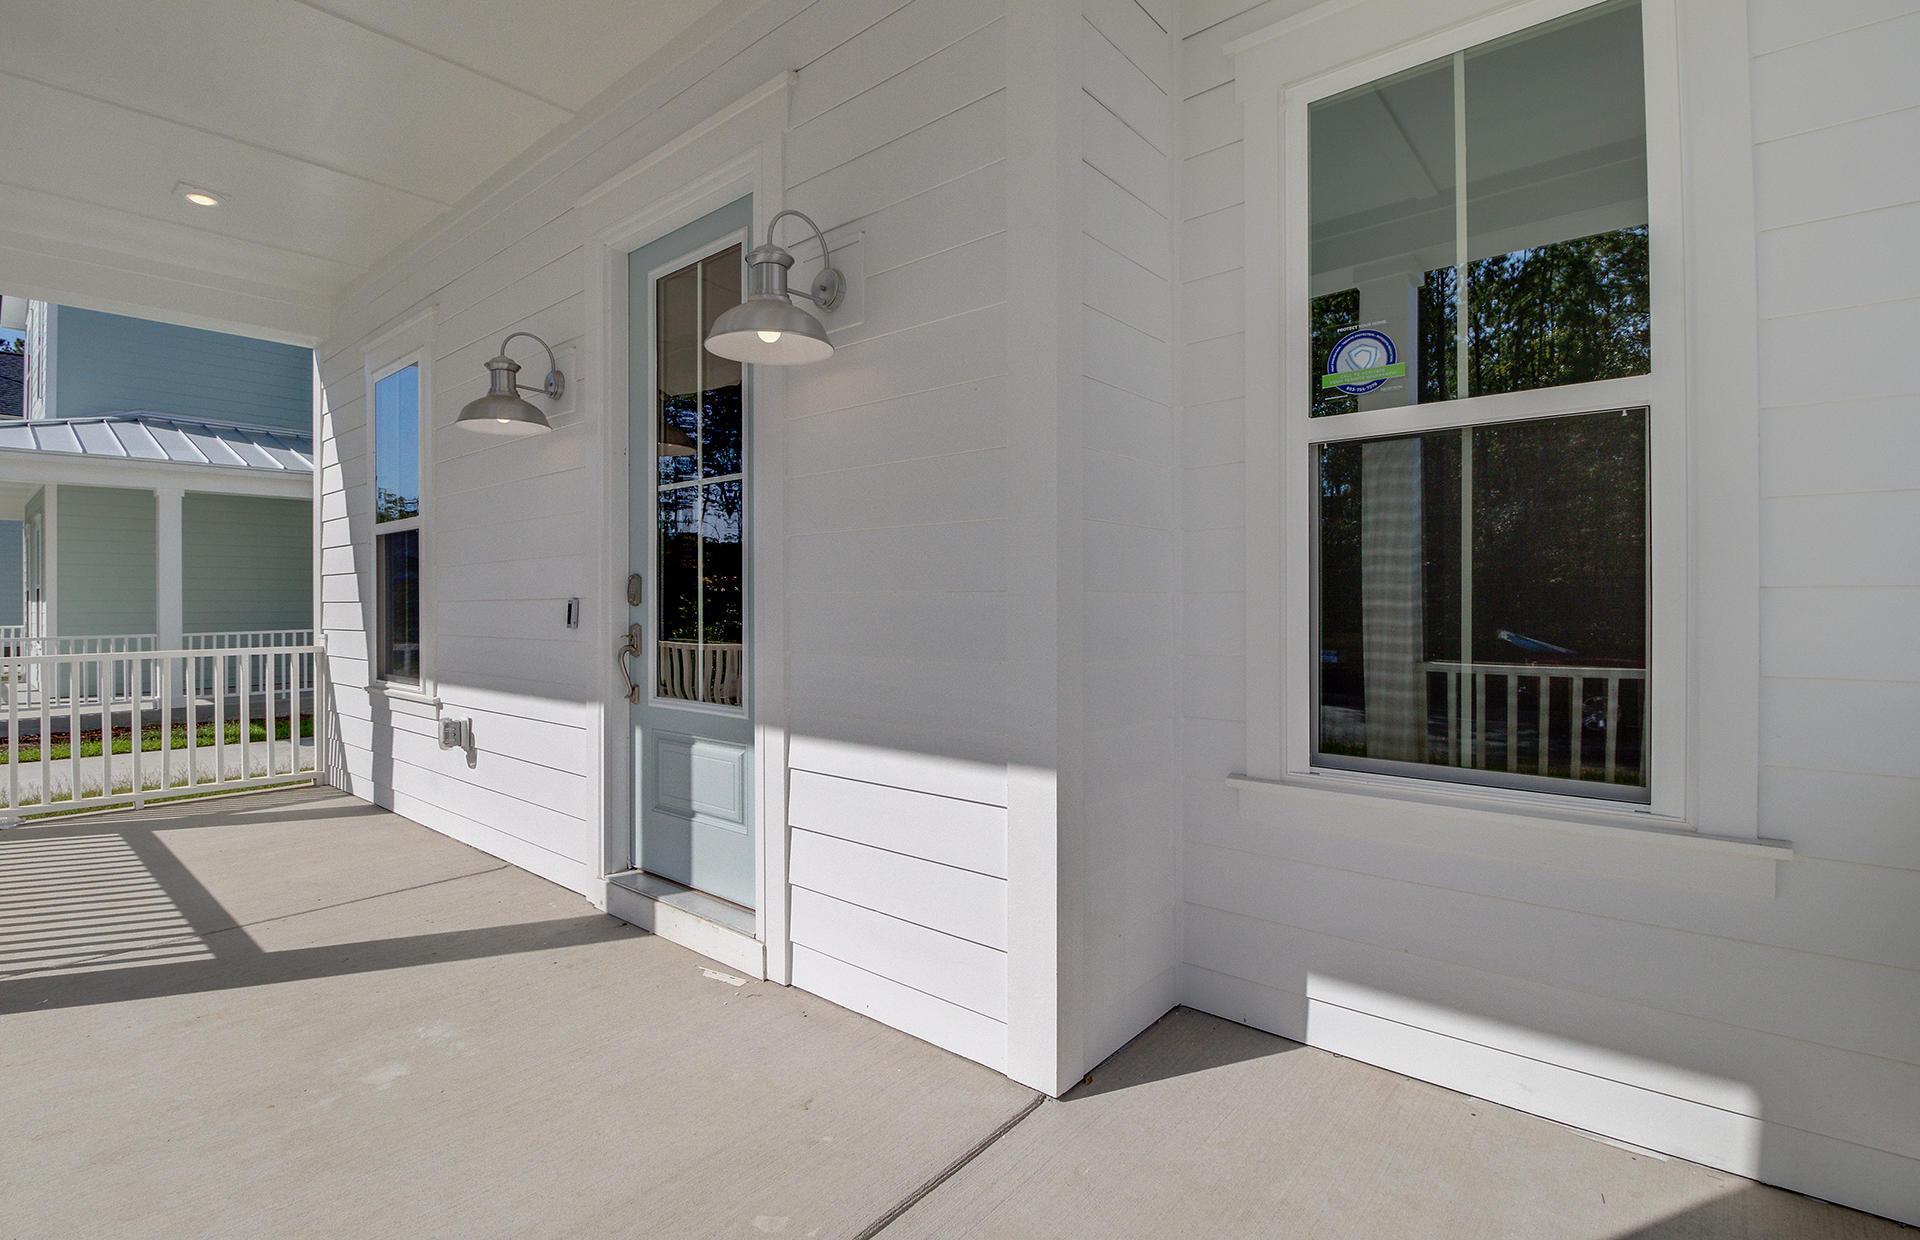 208 West Respite Lane Summerville, Sc 29483